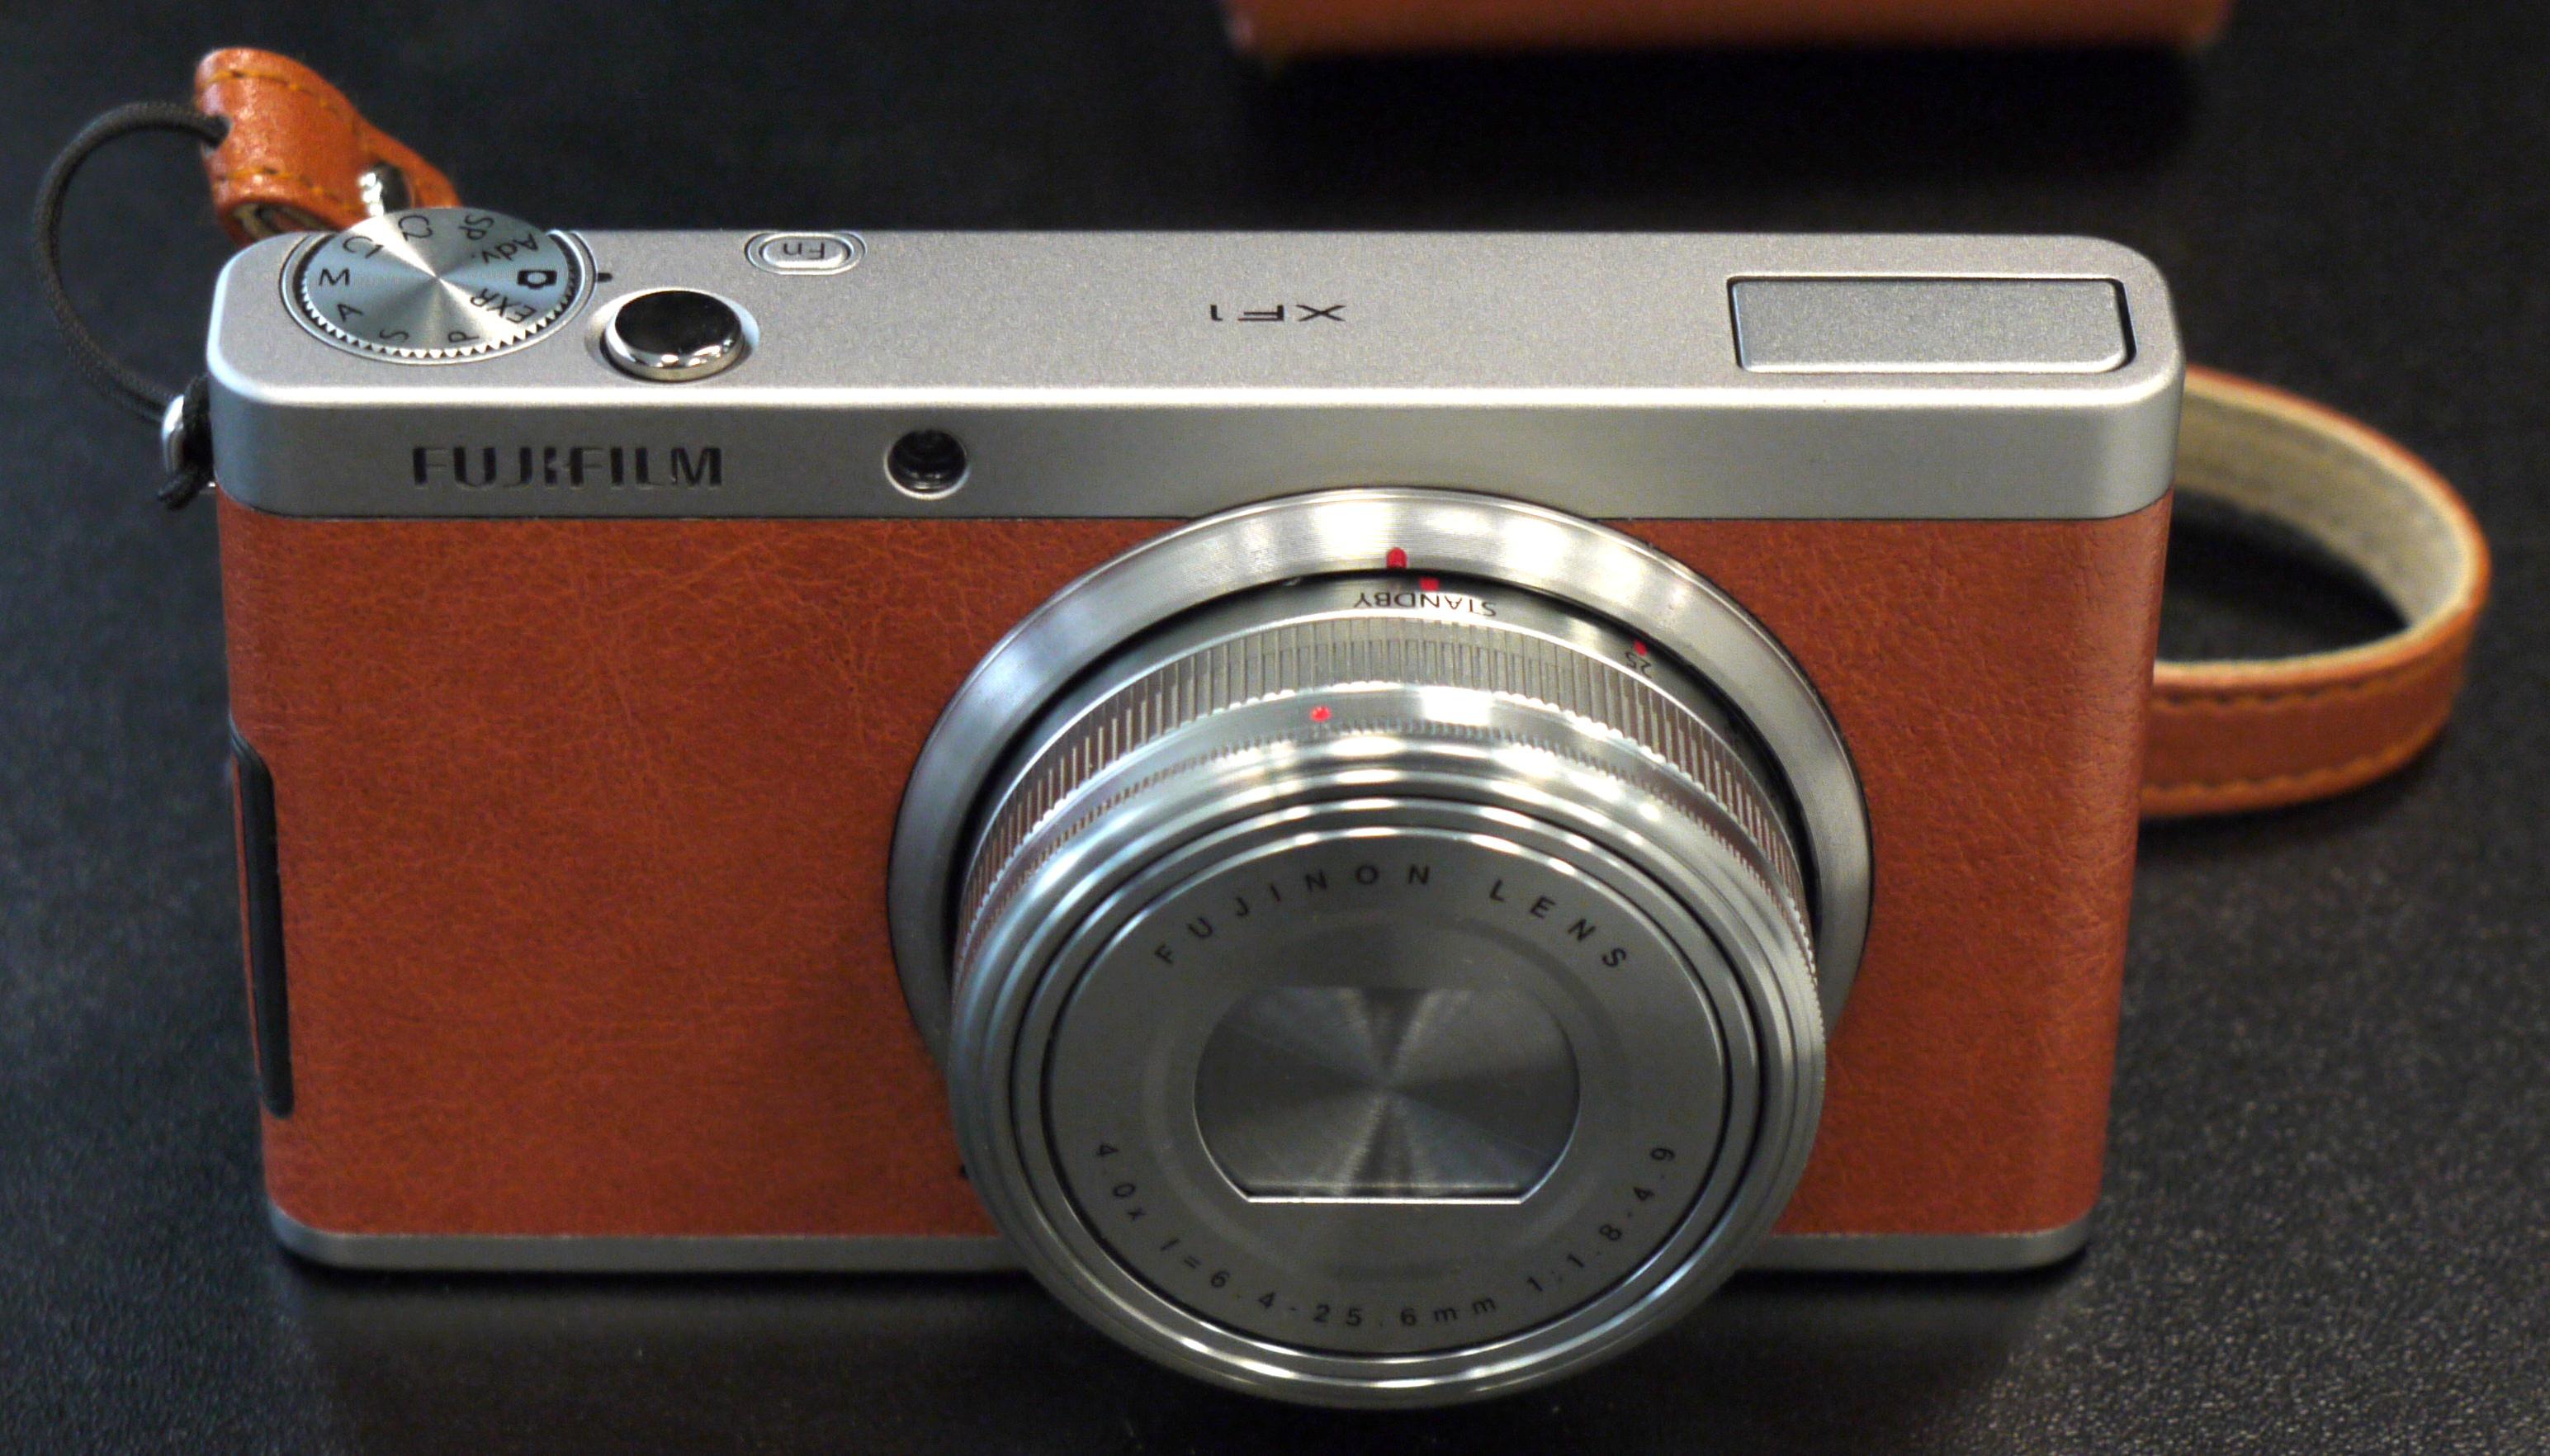 fuji xf1 user manual rh fuji xf1 user manual mollysmenu us Fujifilm FinePix Fujifilm FX1